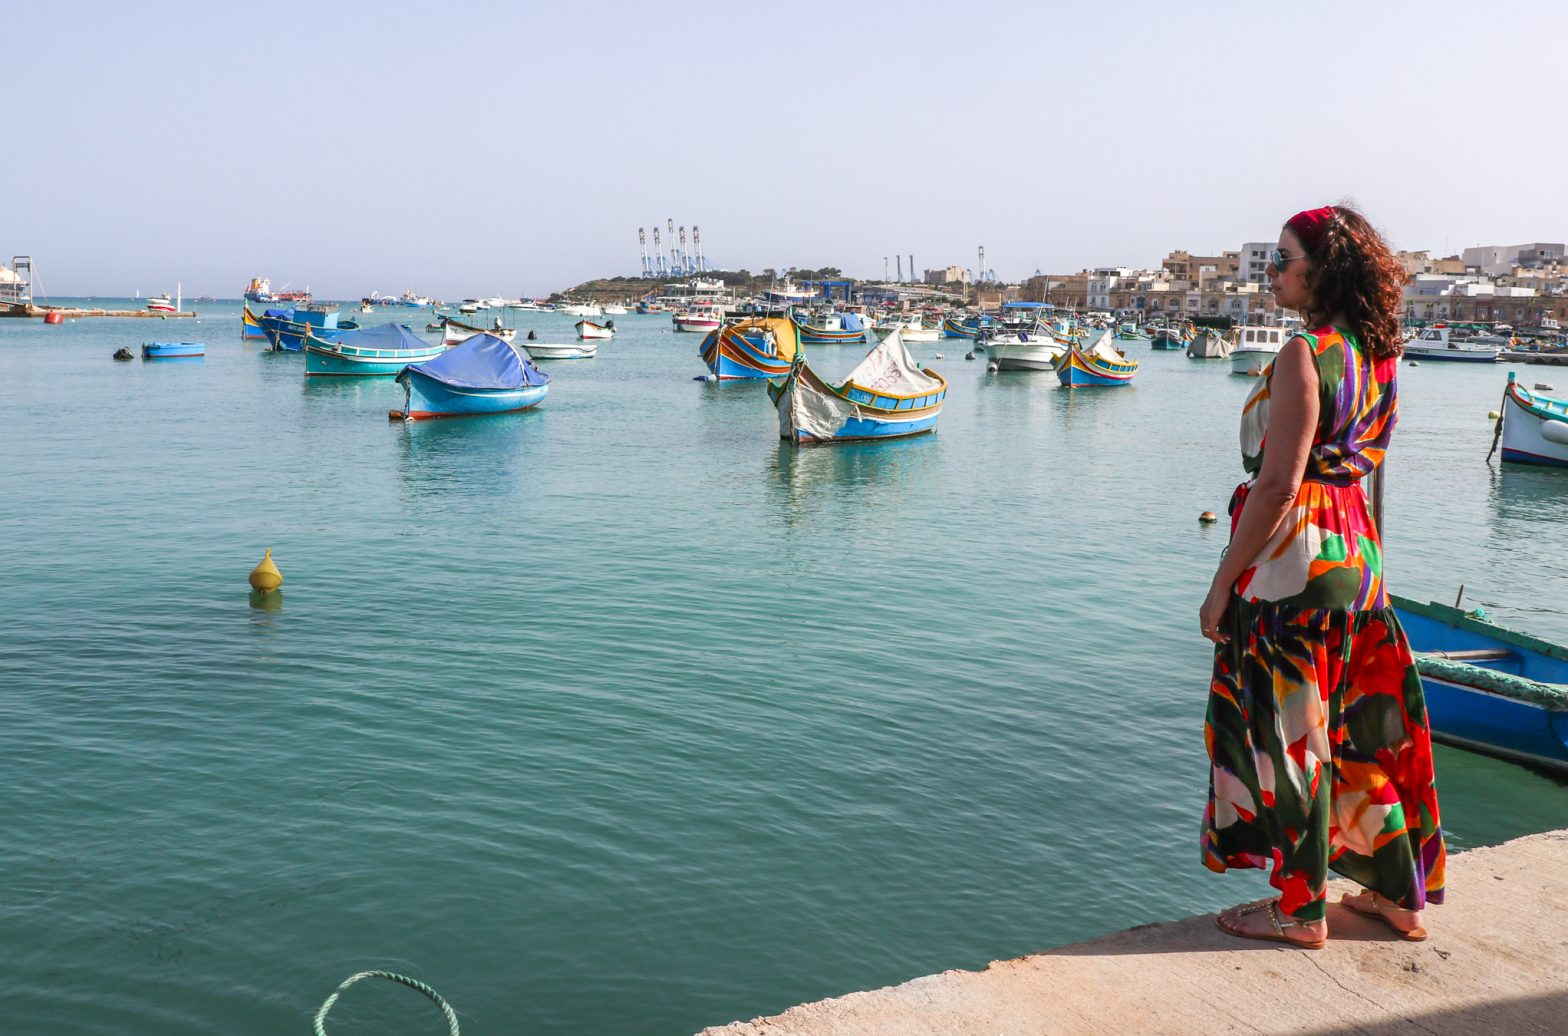 Baia de Marsaxlokk